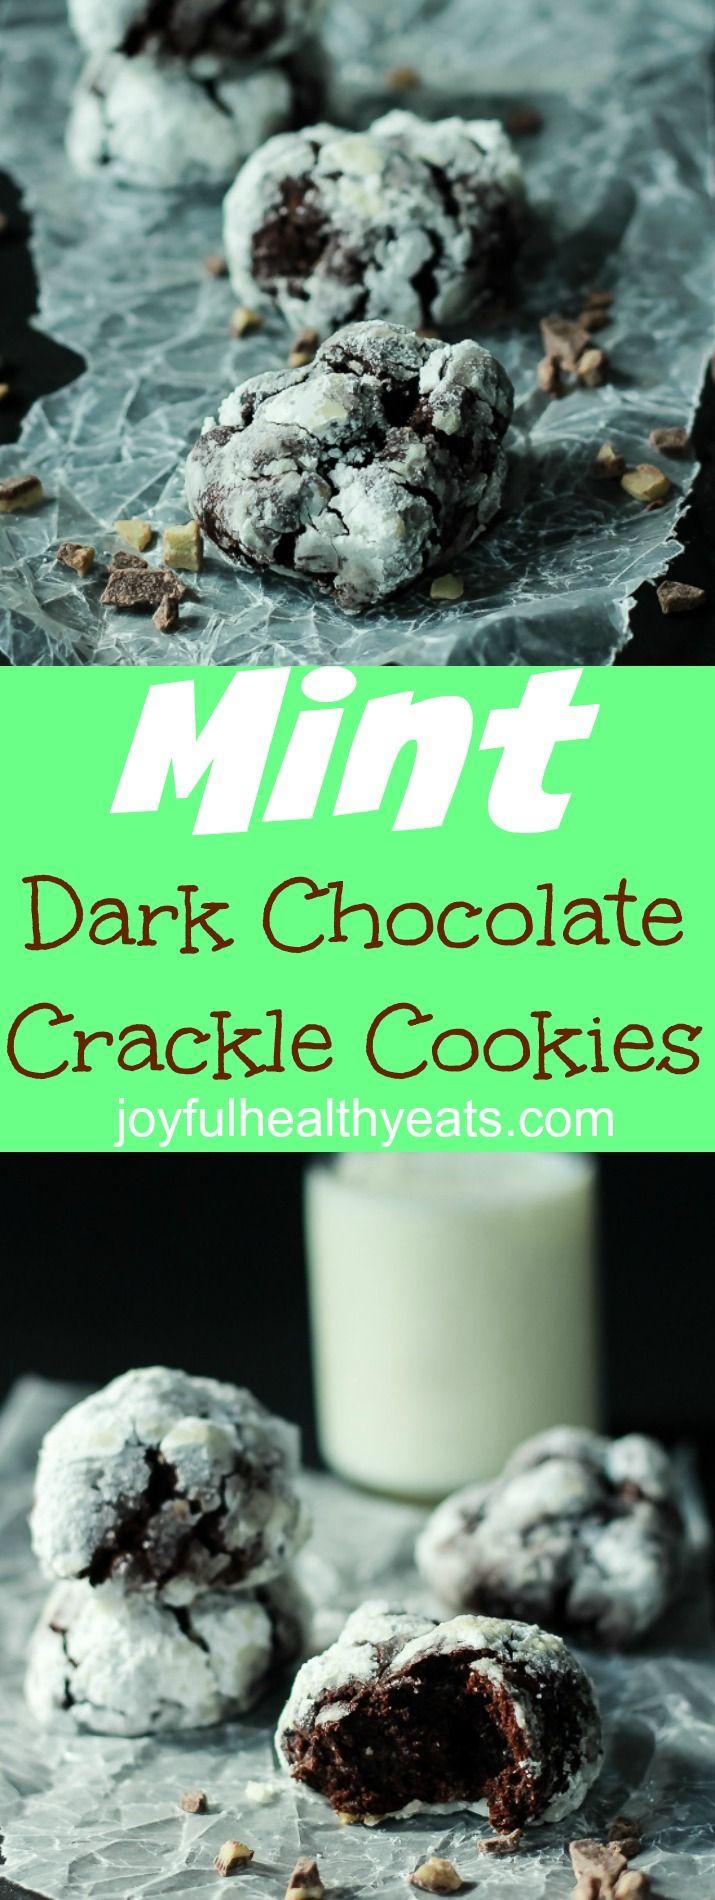 Best 20+ Chocolate crackle cookies ideas on Pinterest | Chocolate ...